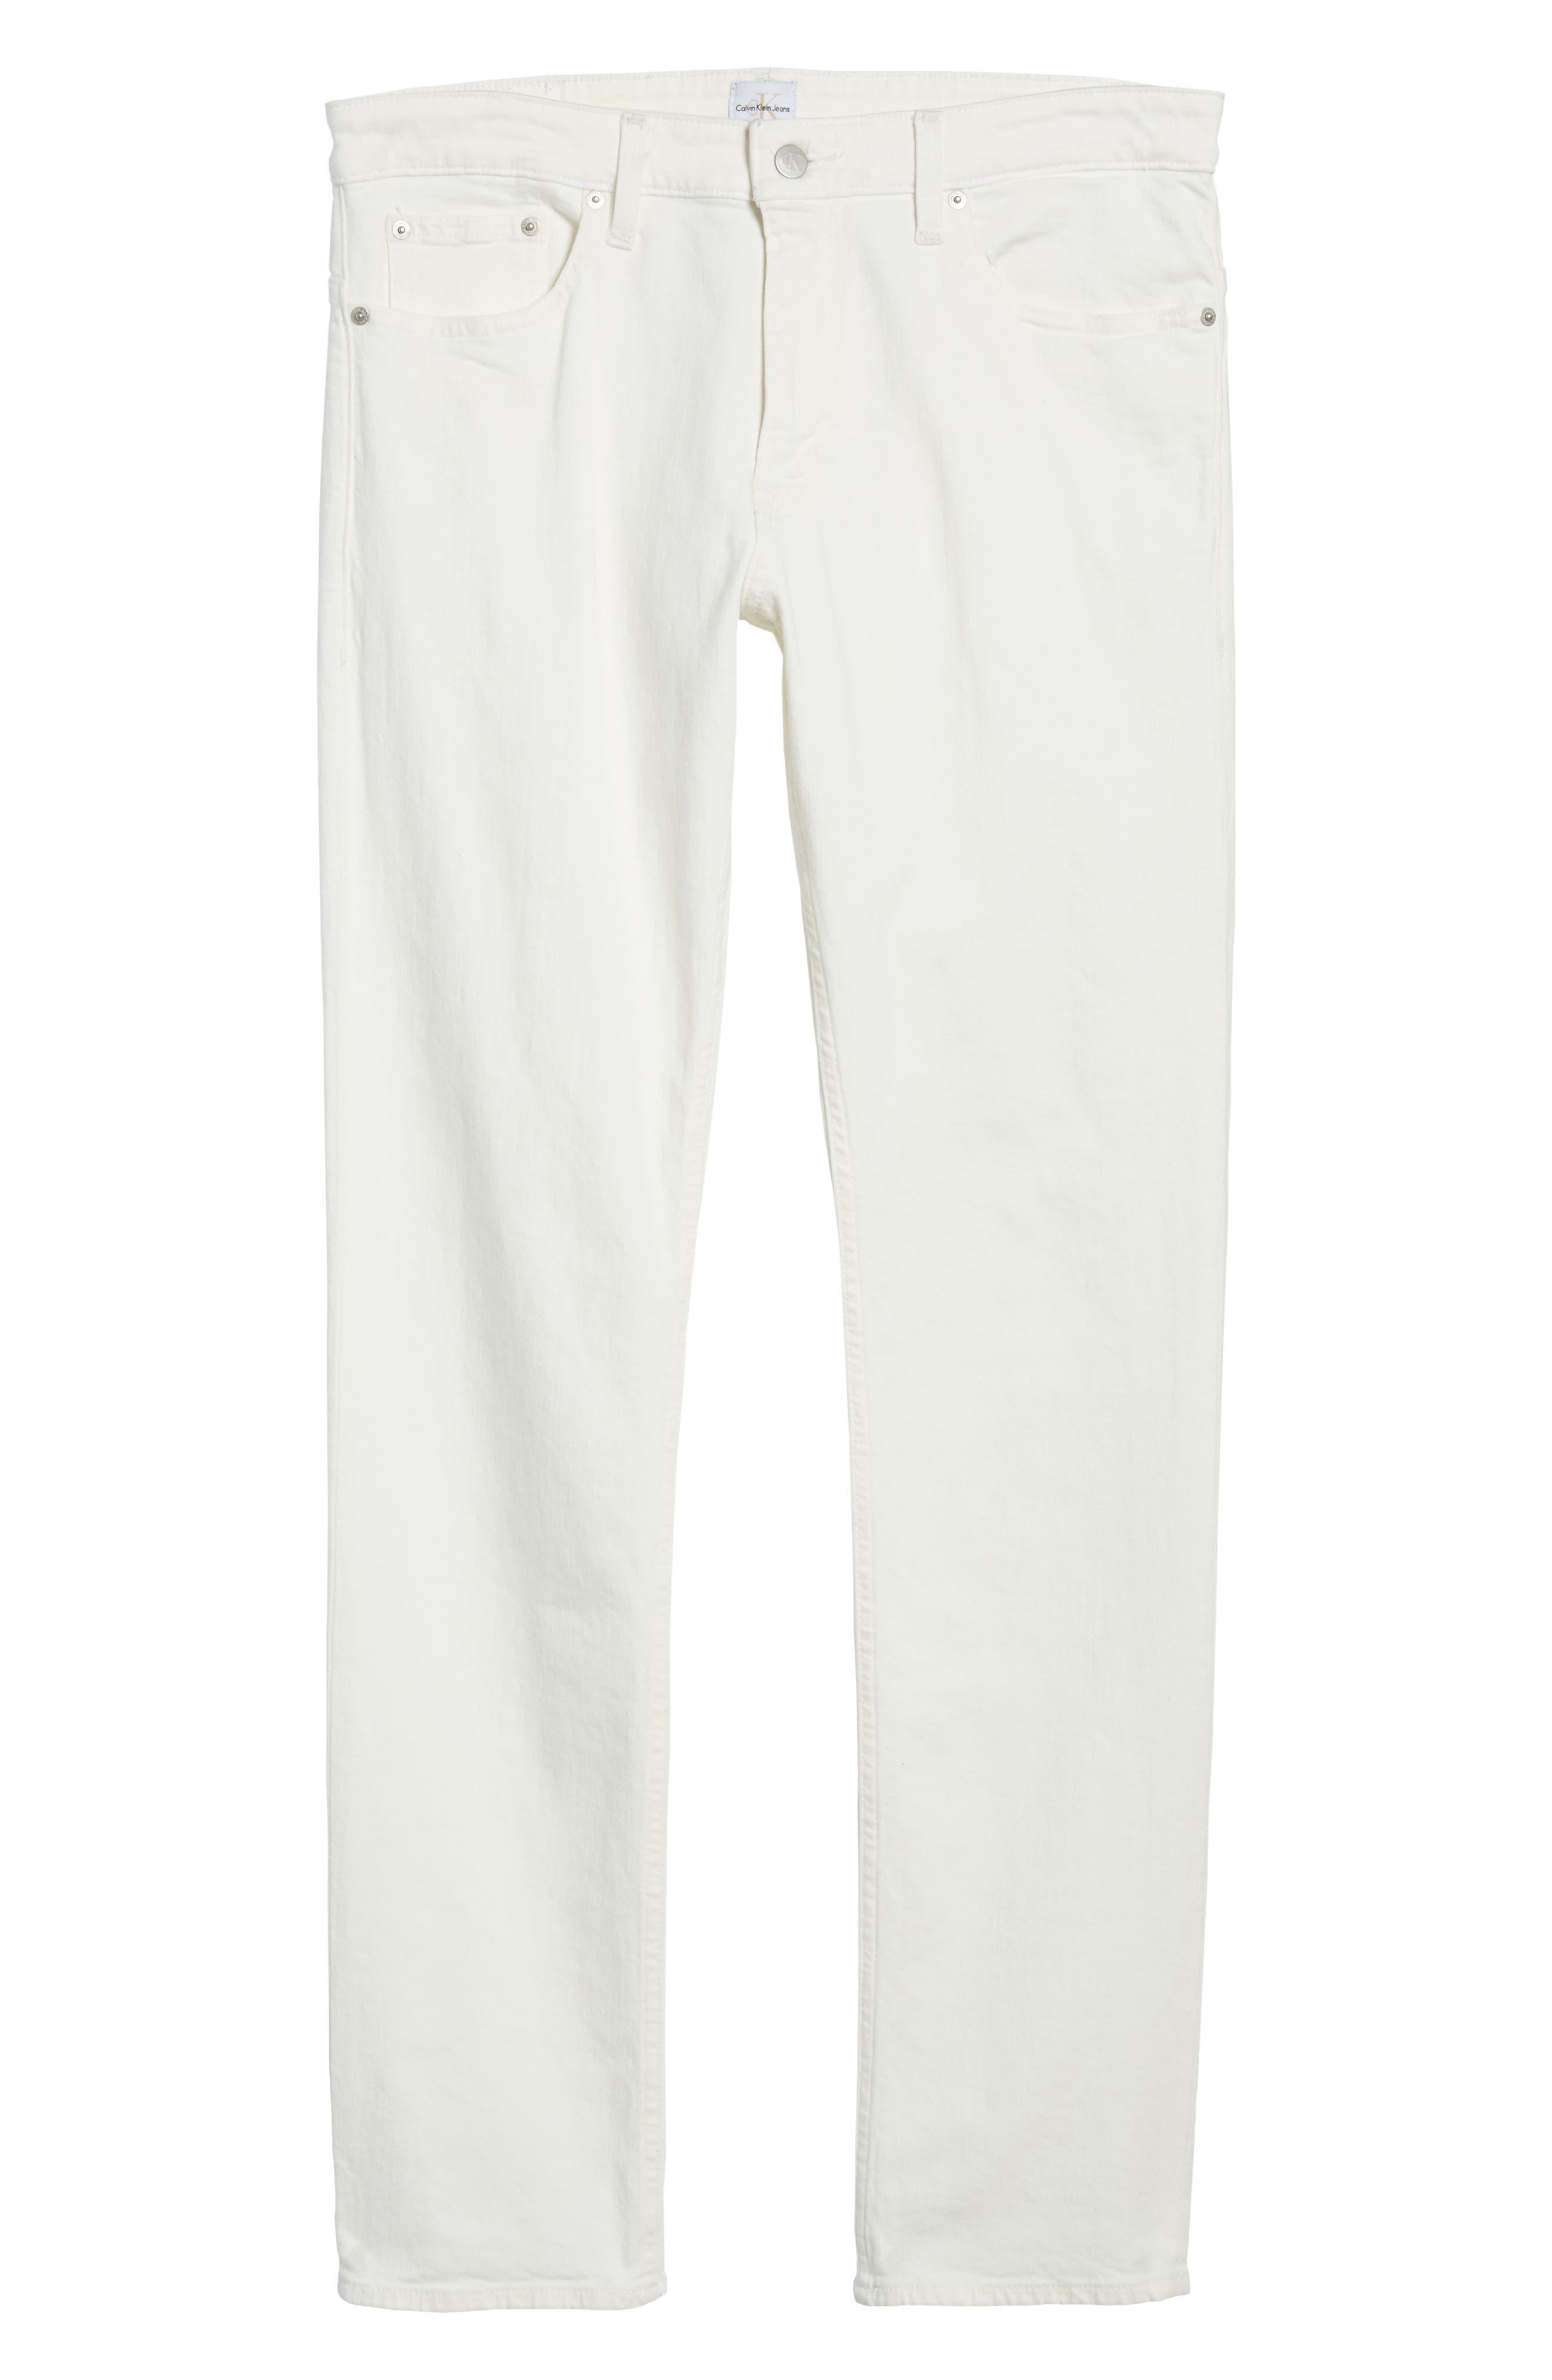 Slim Fit Jeans,                             Alternate thumbnail 6, color,                             Glass